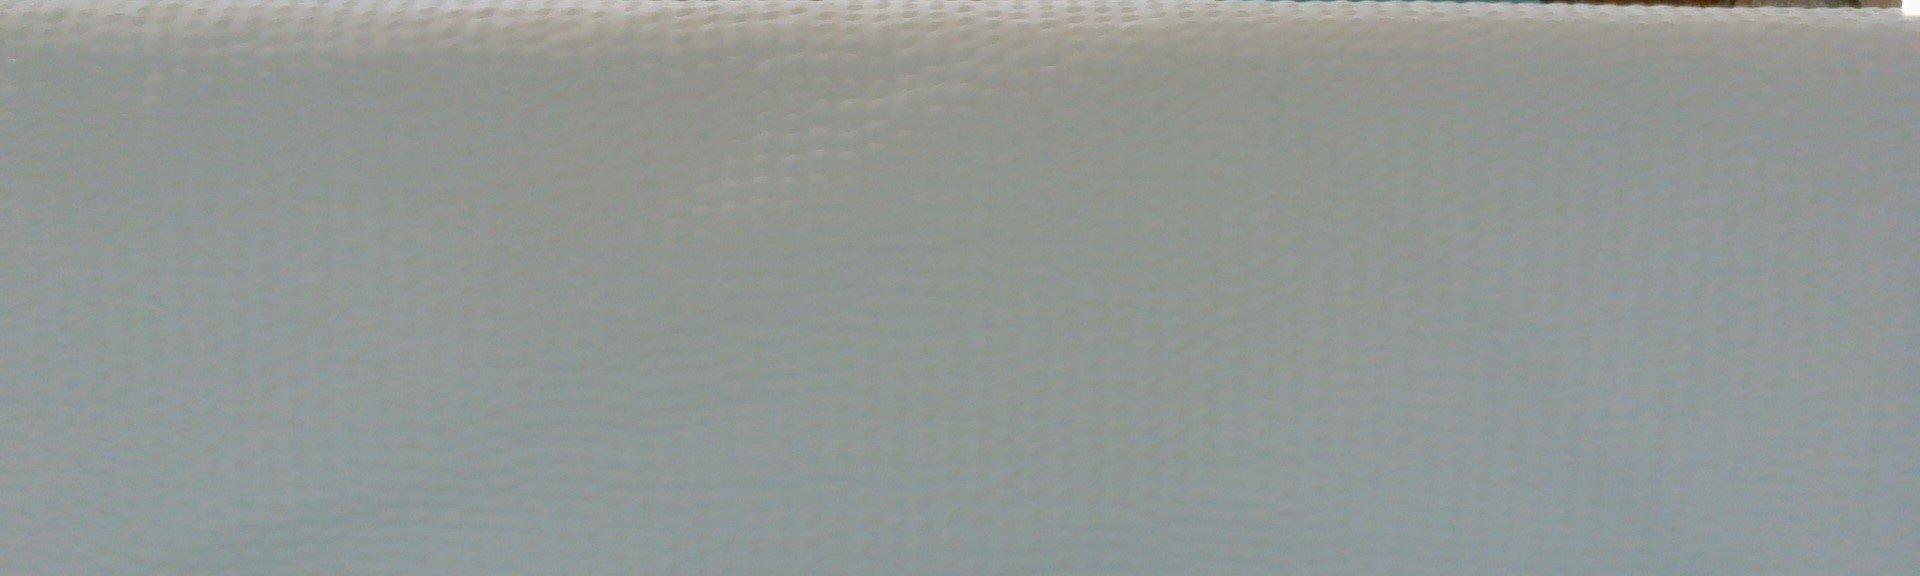 Dacron & Cotton Bubble White 45